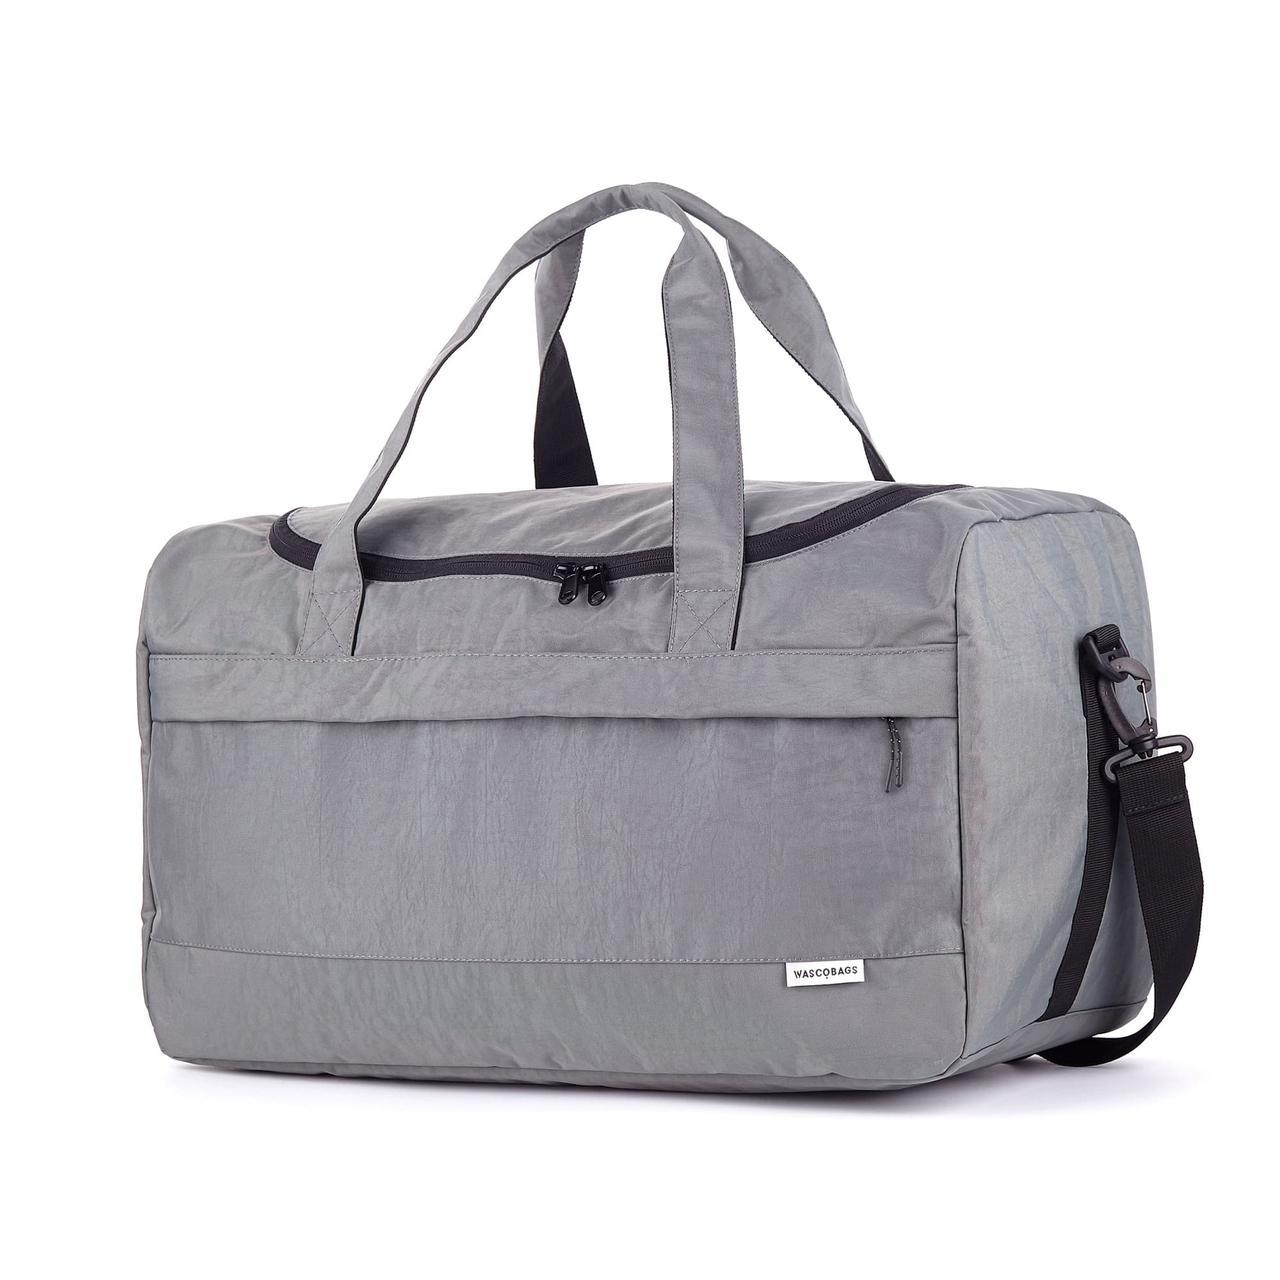 Дорожная сумка Wascobags Warsaw Серая (34 L)